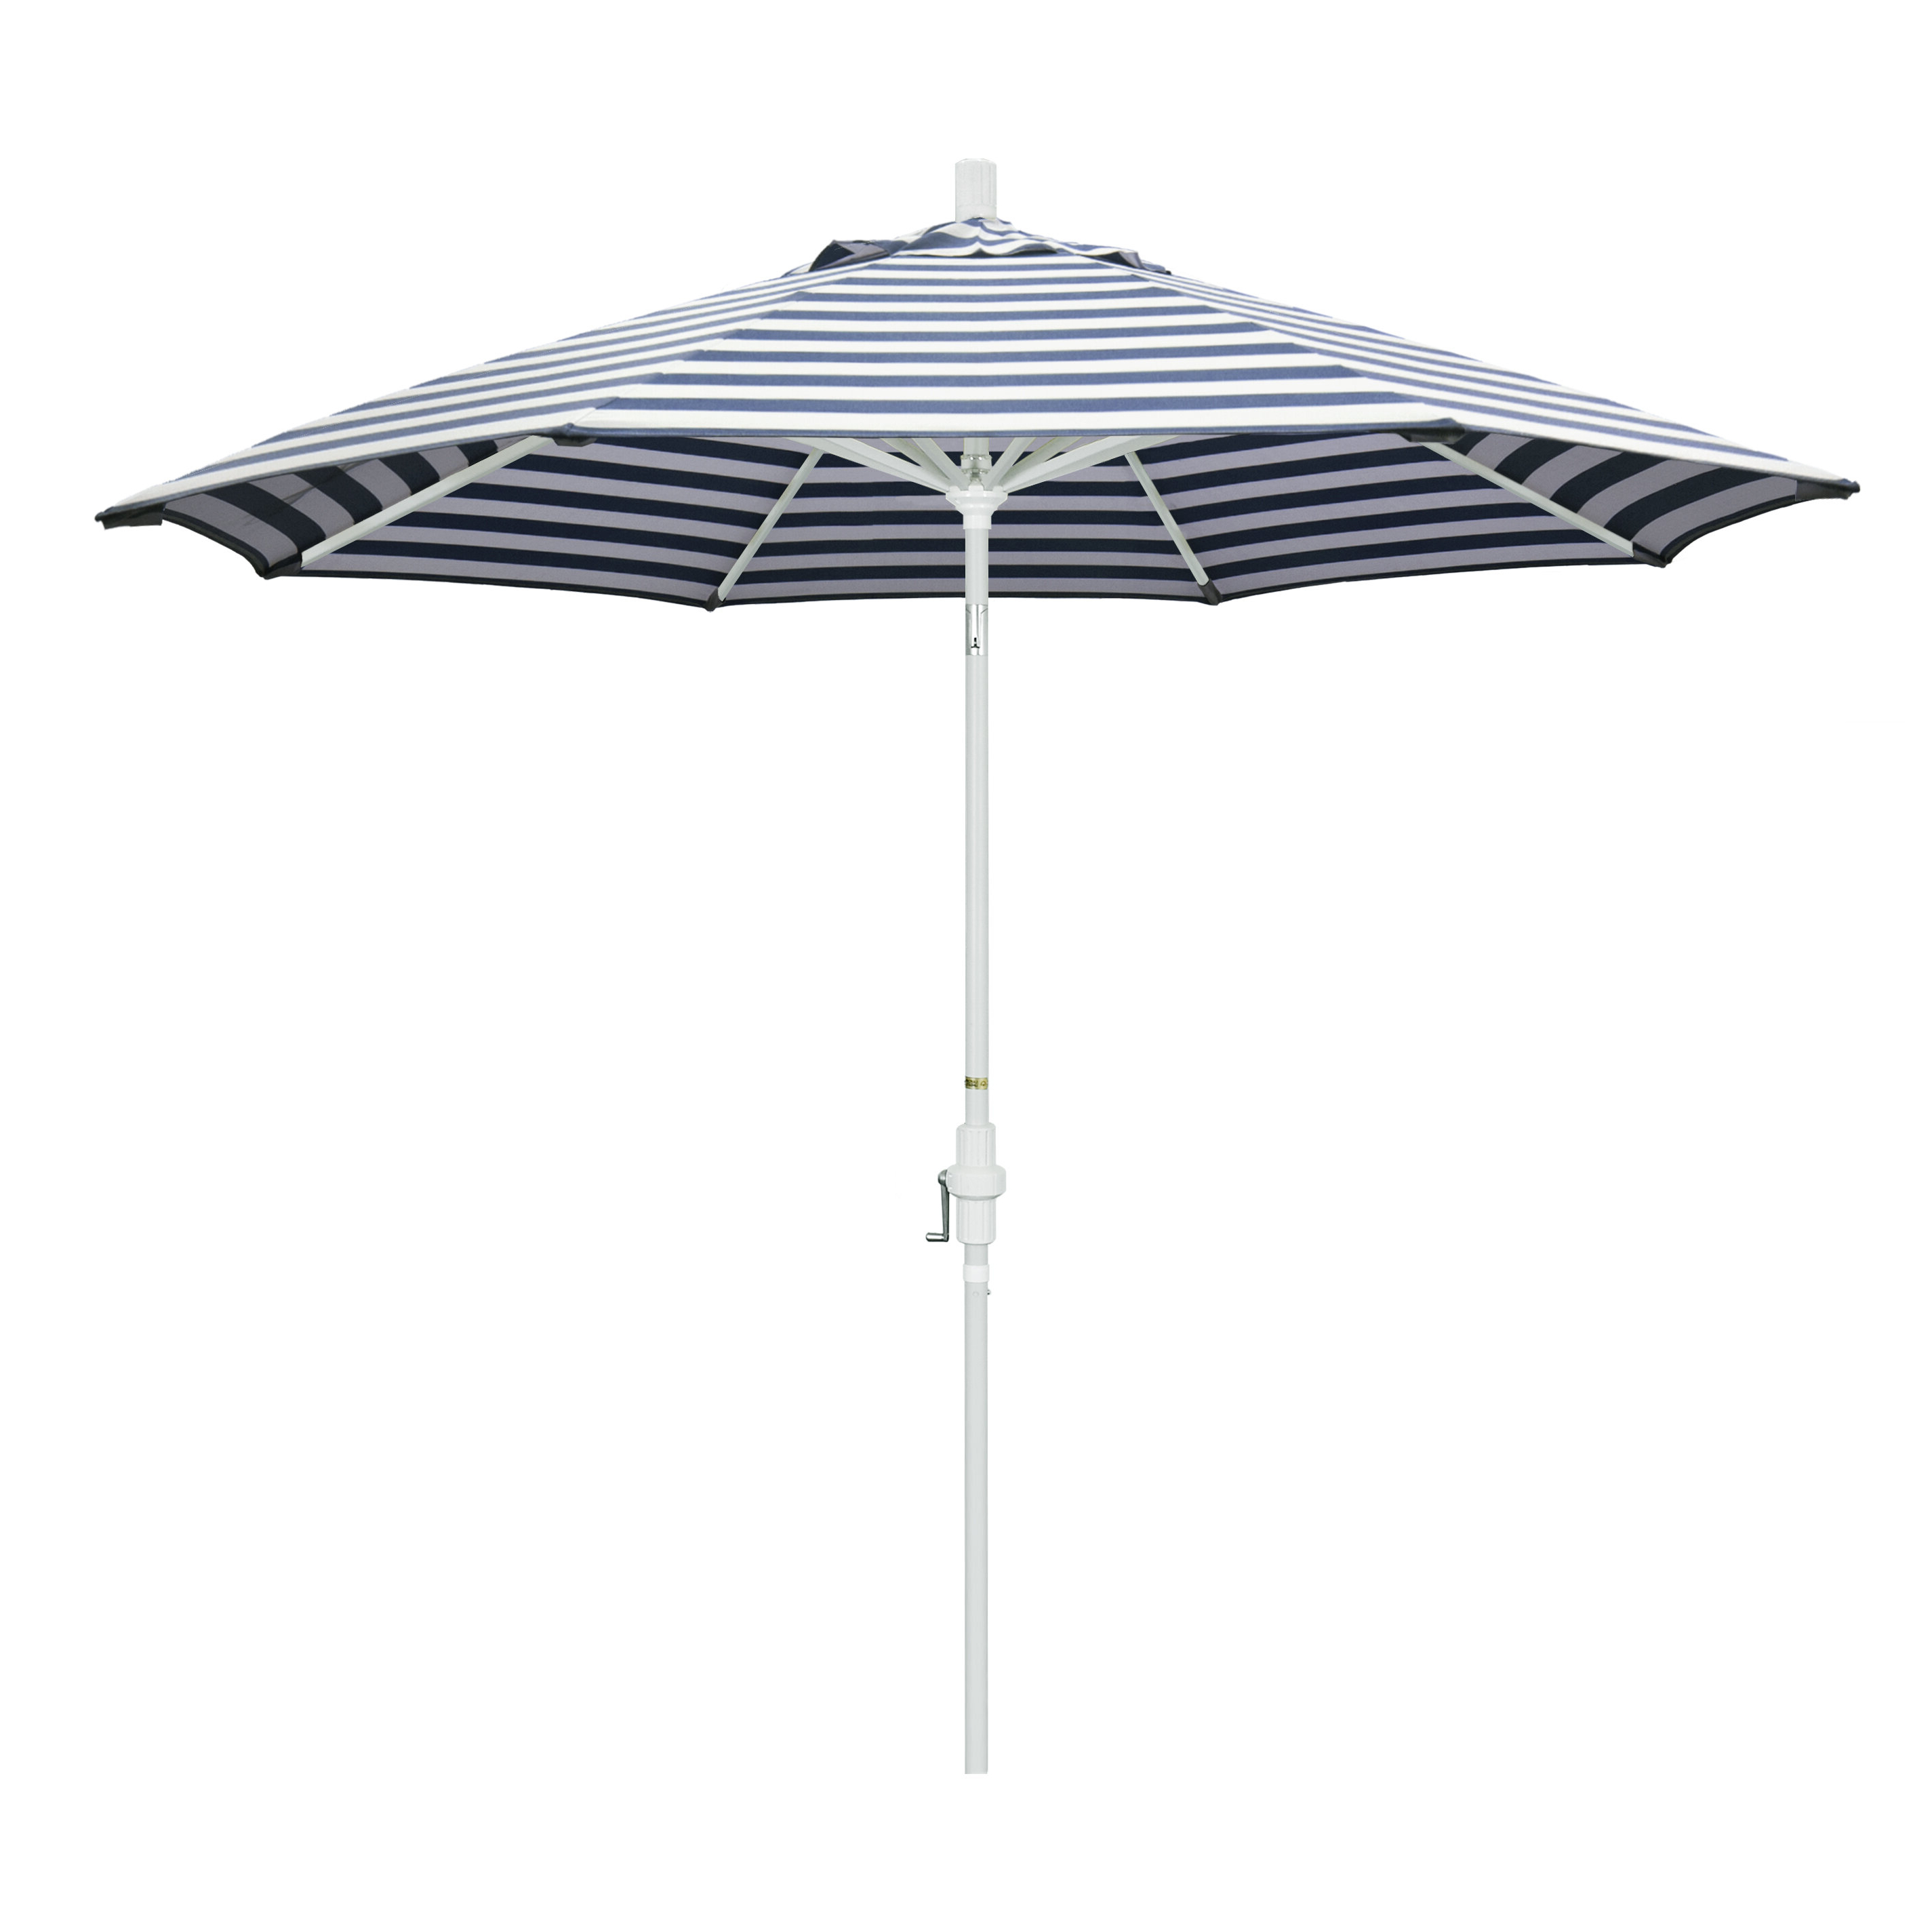 Pedrick Drape Market Umbrellas In Most Recently Released 9' Market Umbrella (View 12 of 20)